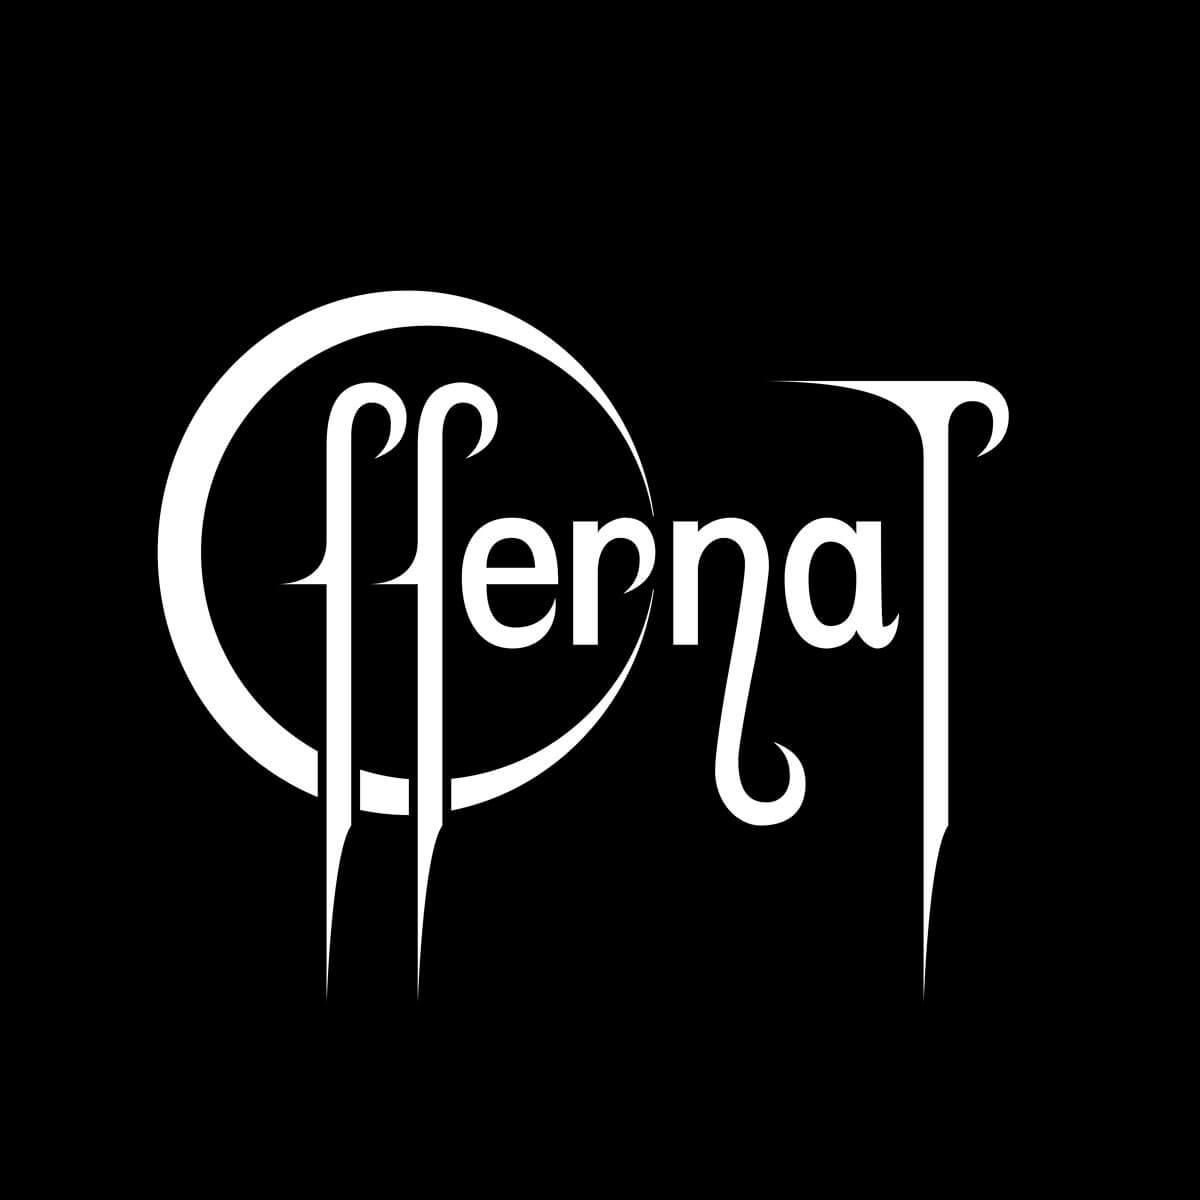 Offernat – Offernat EP